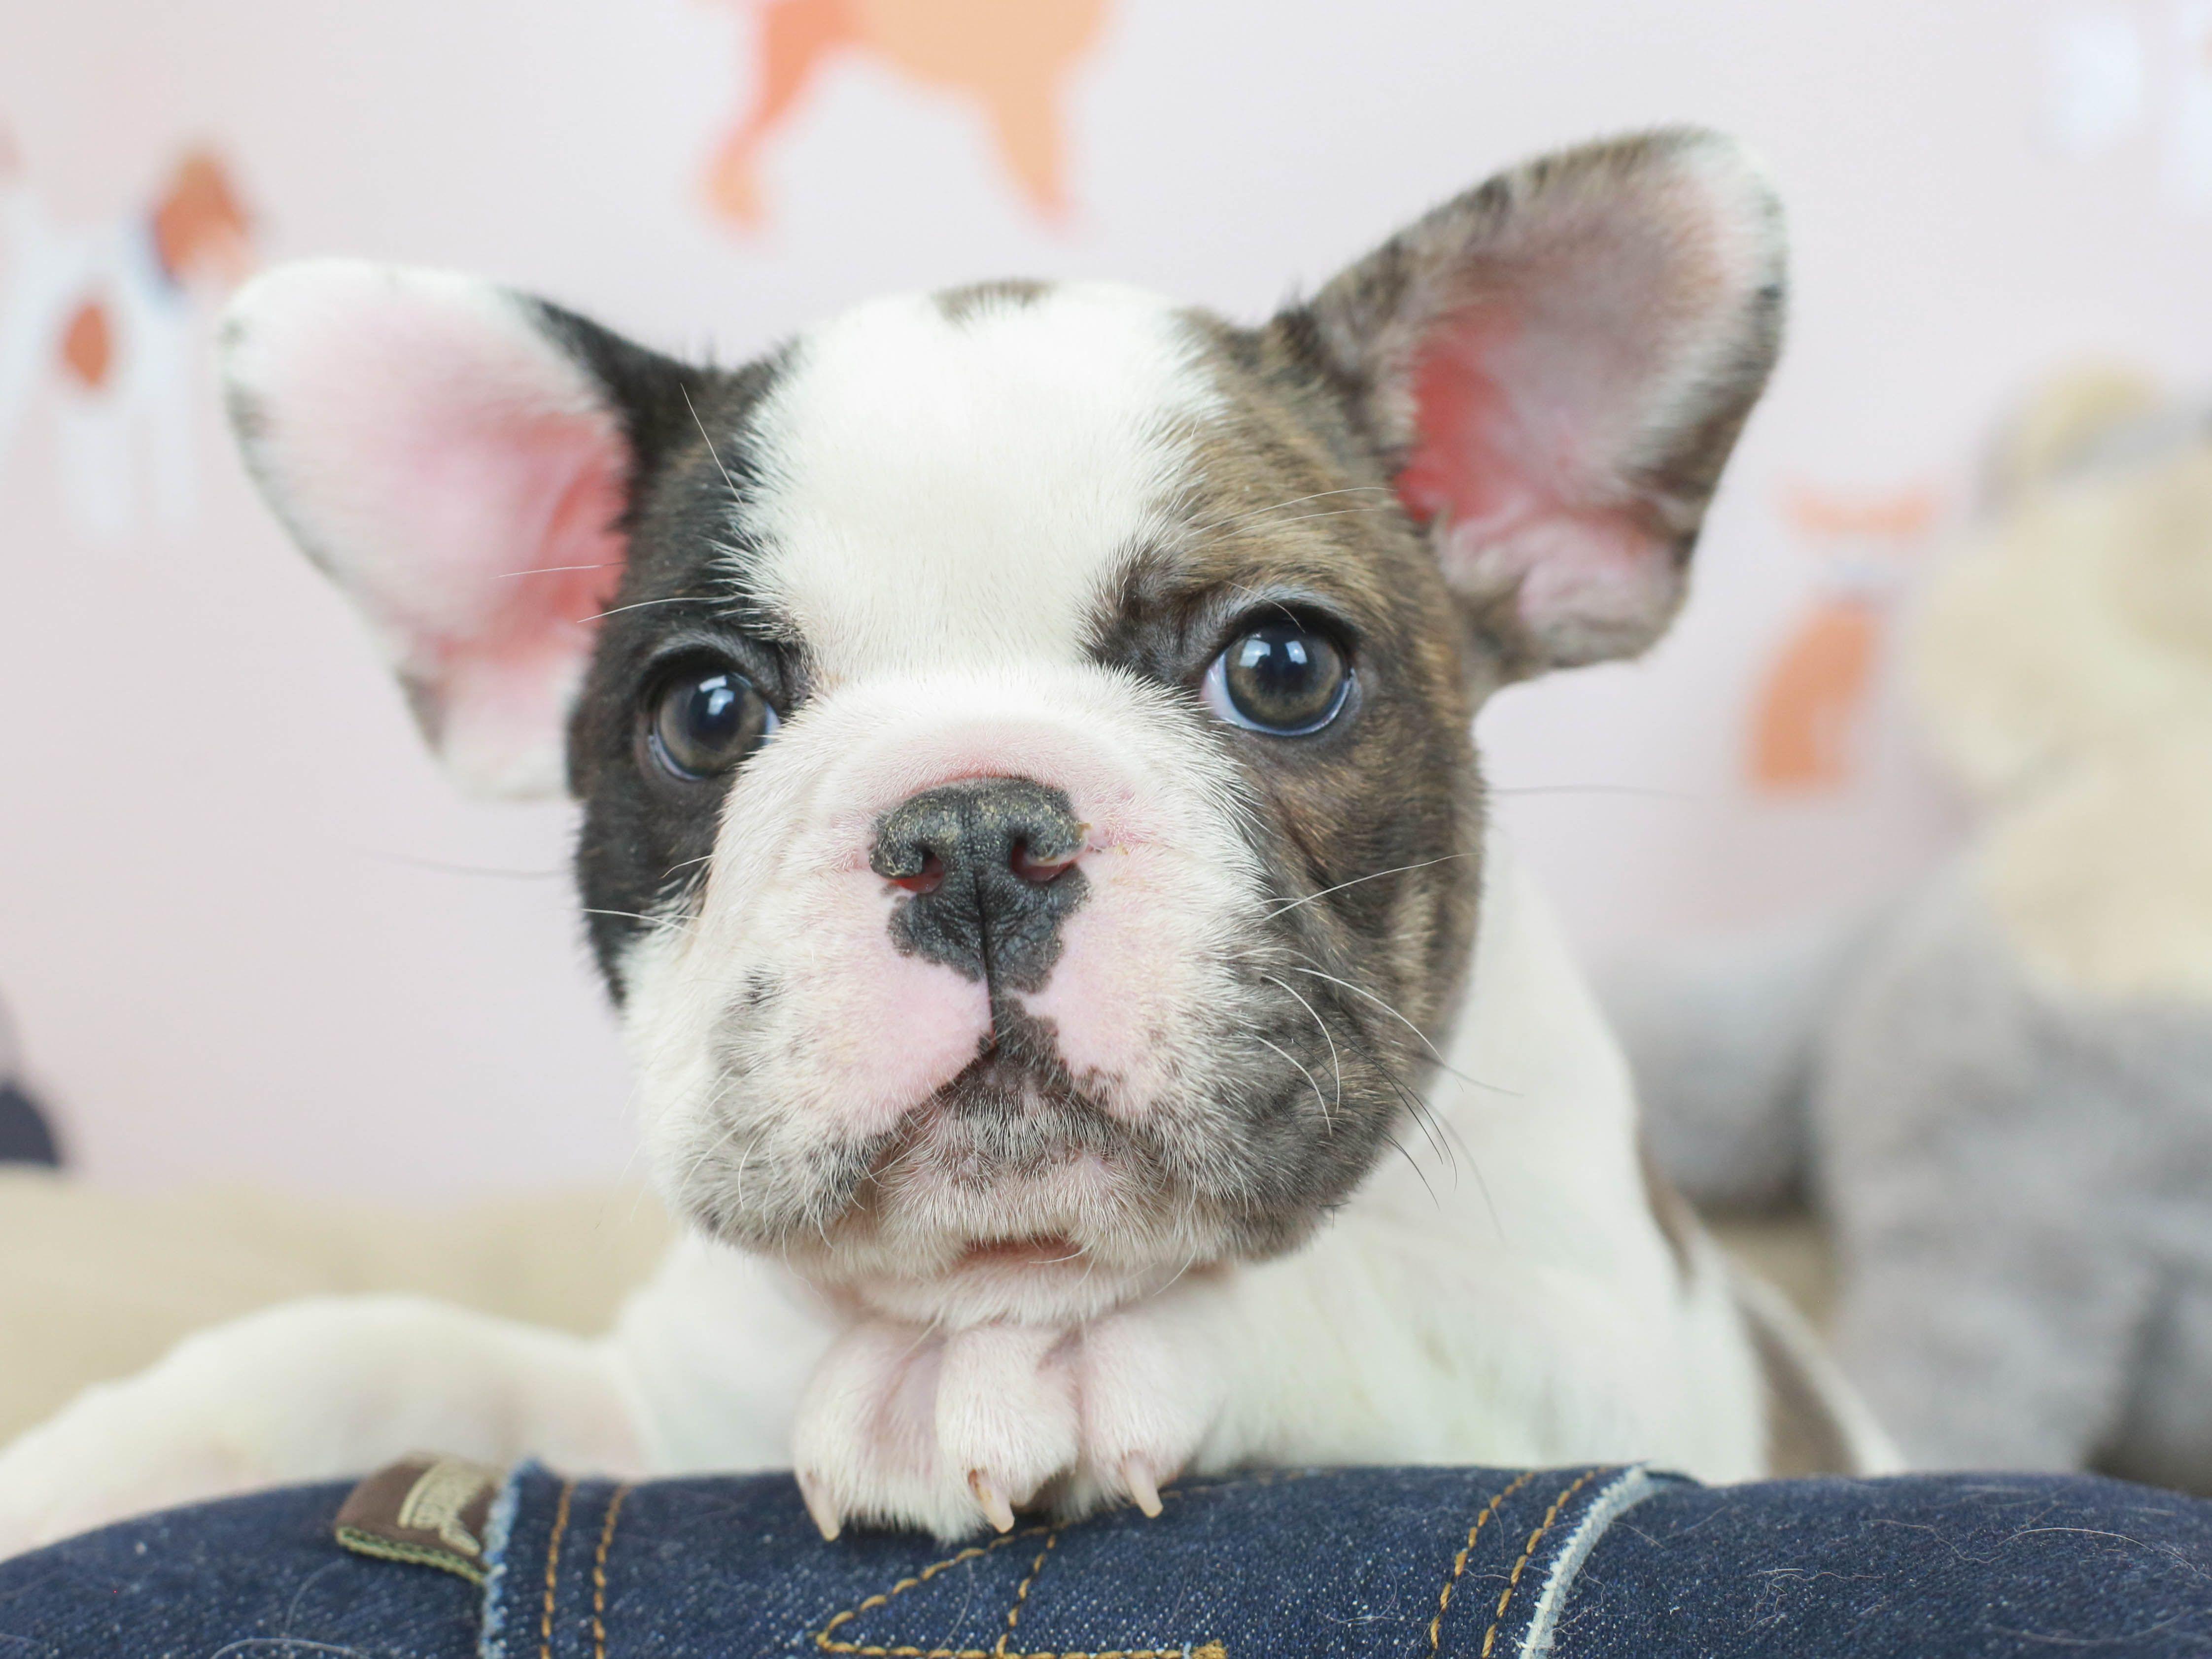 Litter Of 3 Taco Terrier Puppies For Sale In Tucson Az Adn 27694 On Puppyfinder Com Gender Female Age 5 Week Puppies For Sale Taco Terrier Terrier Puppies